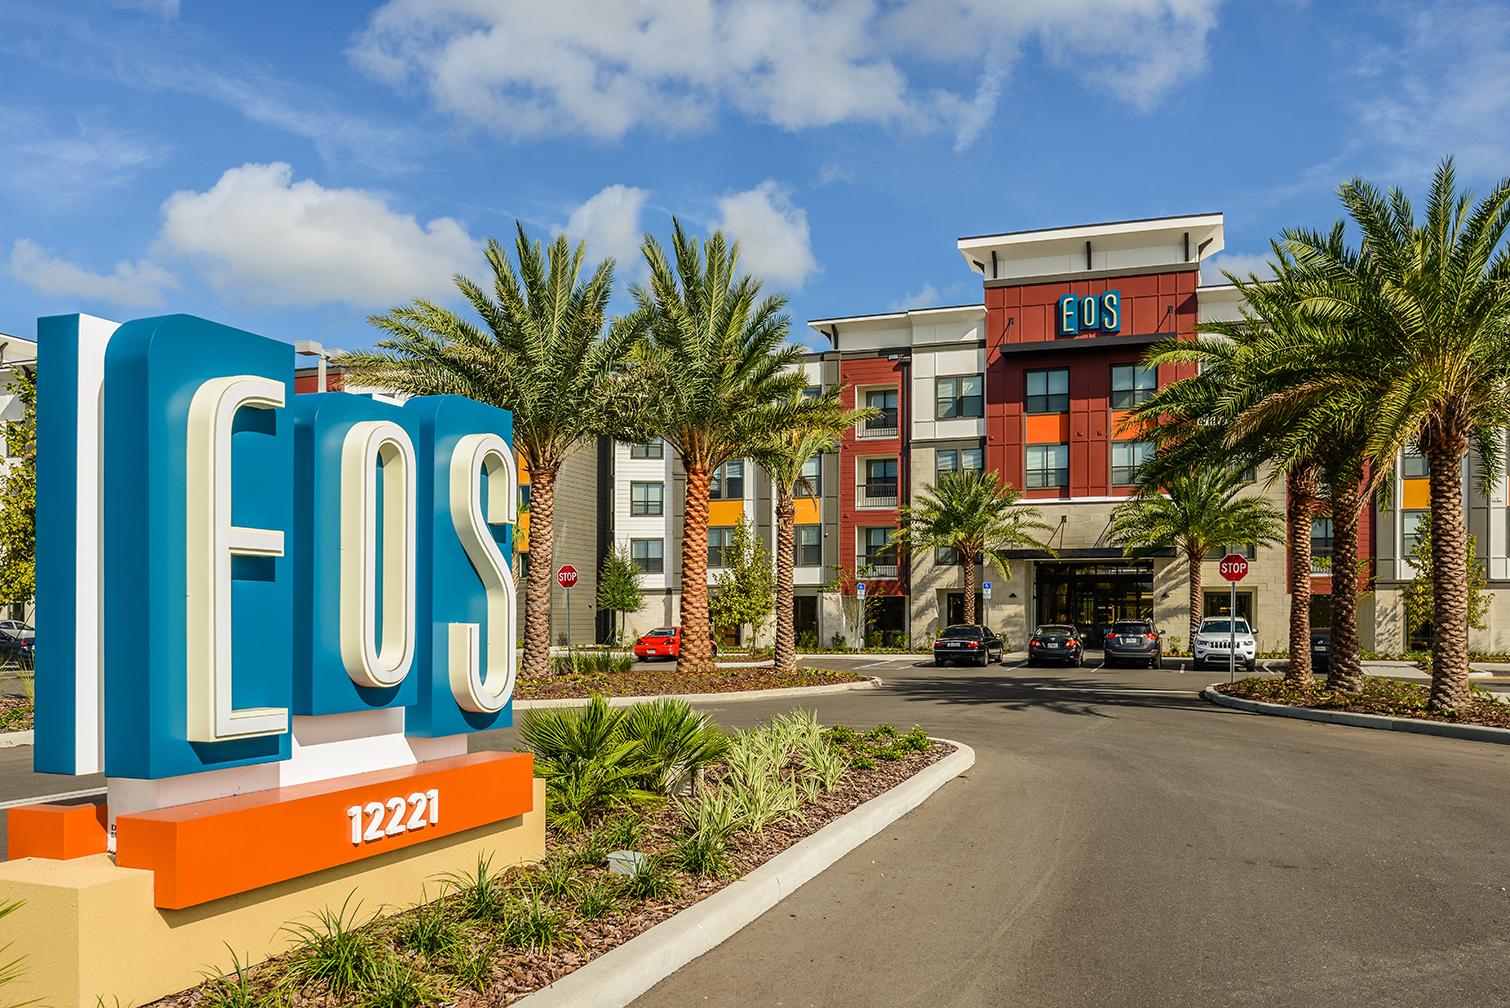 Greystar--EOS-Apartments-8481.jpg